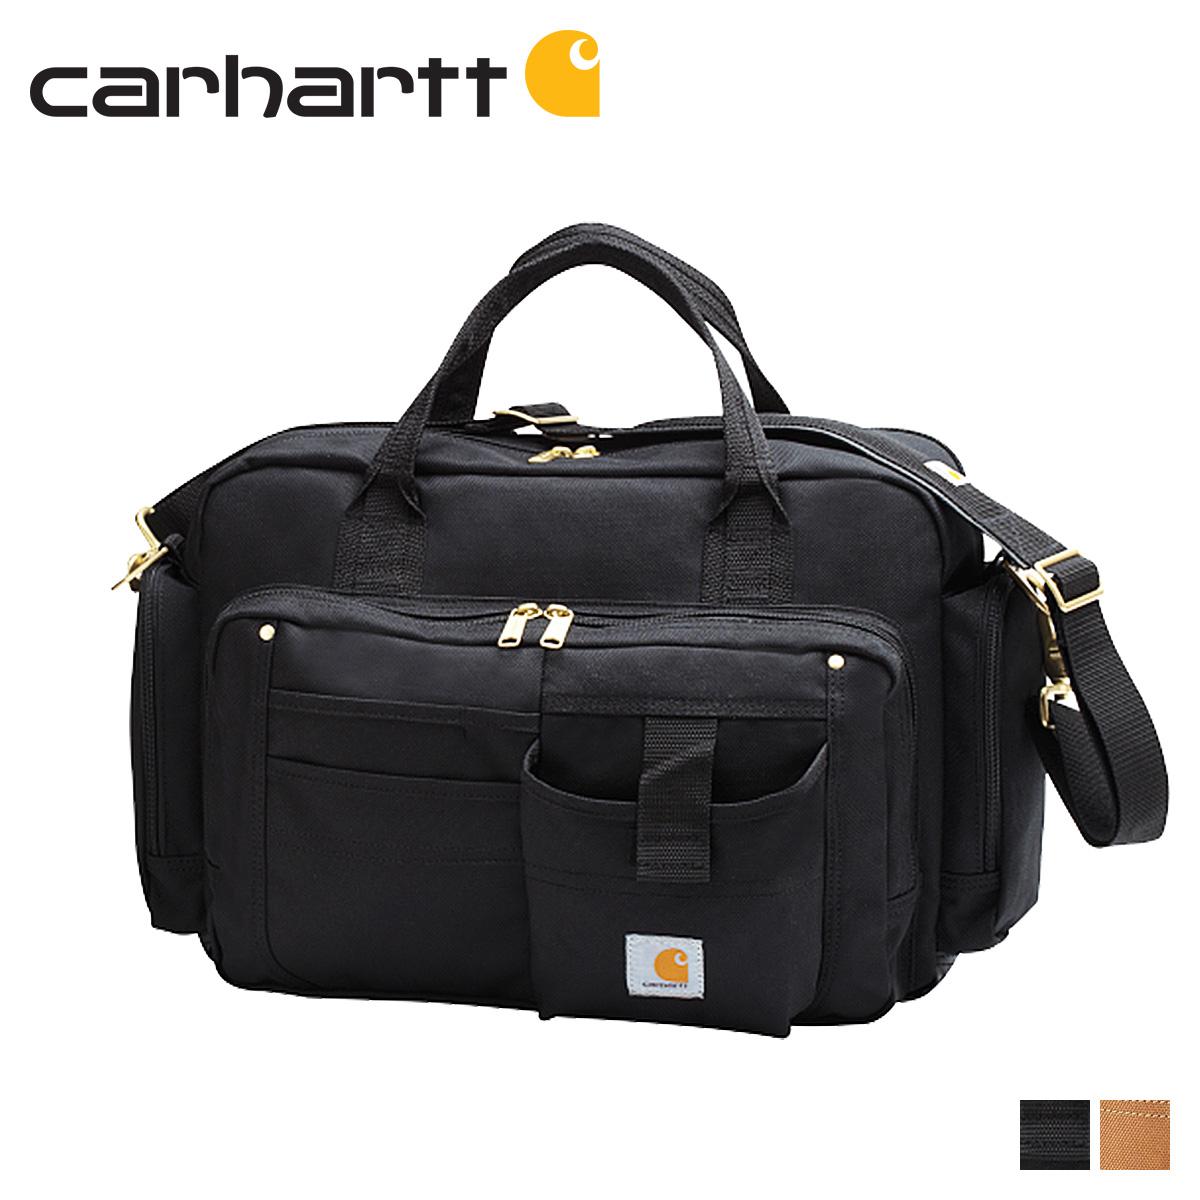 carhartt LEGACY DELUXE BRIEF BAG カーハート バッグ ブリーフケース メンズ レディース ブラック ブラウン 黒 100431 [7/19 新入荷]